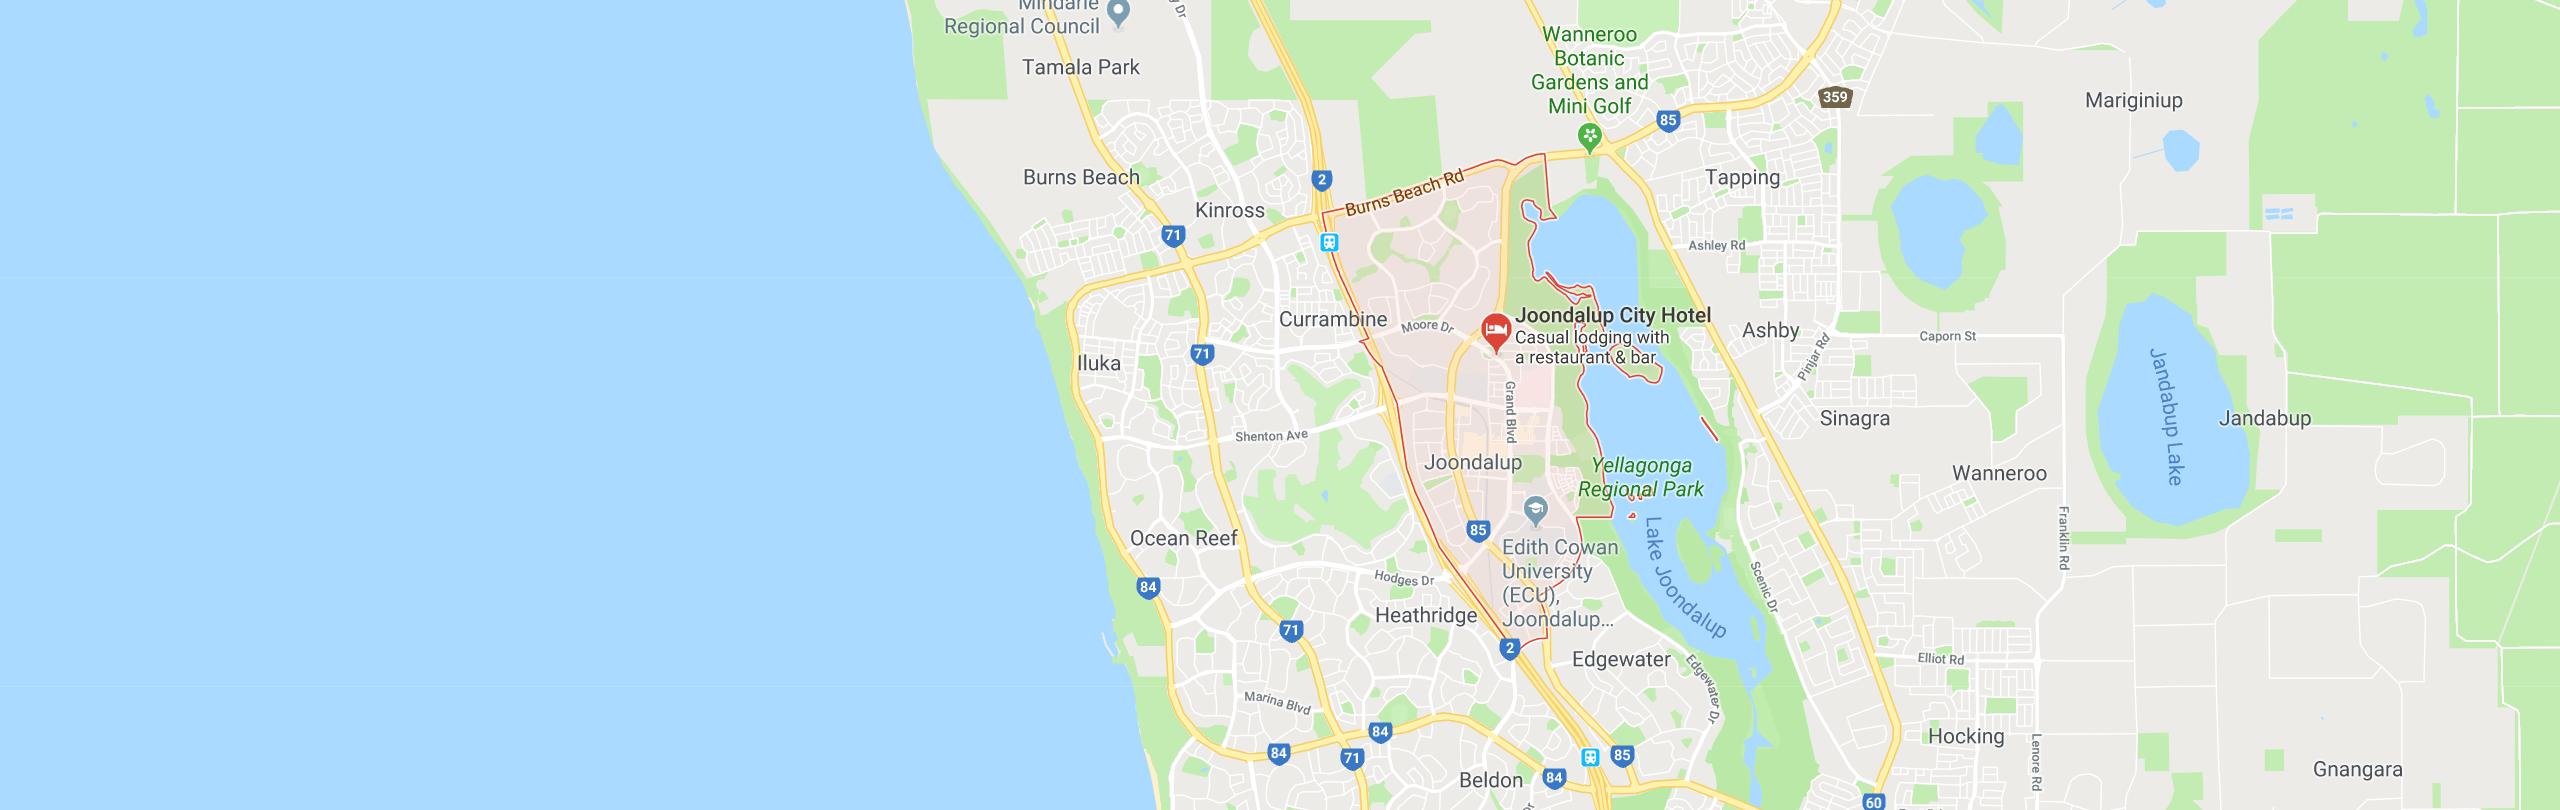 Google Map of Joondalup,Western Australia, Australia